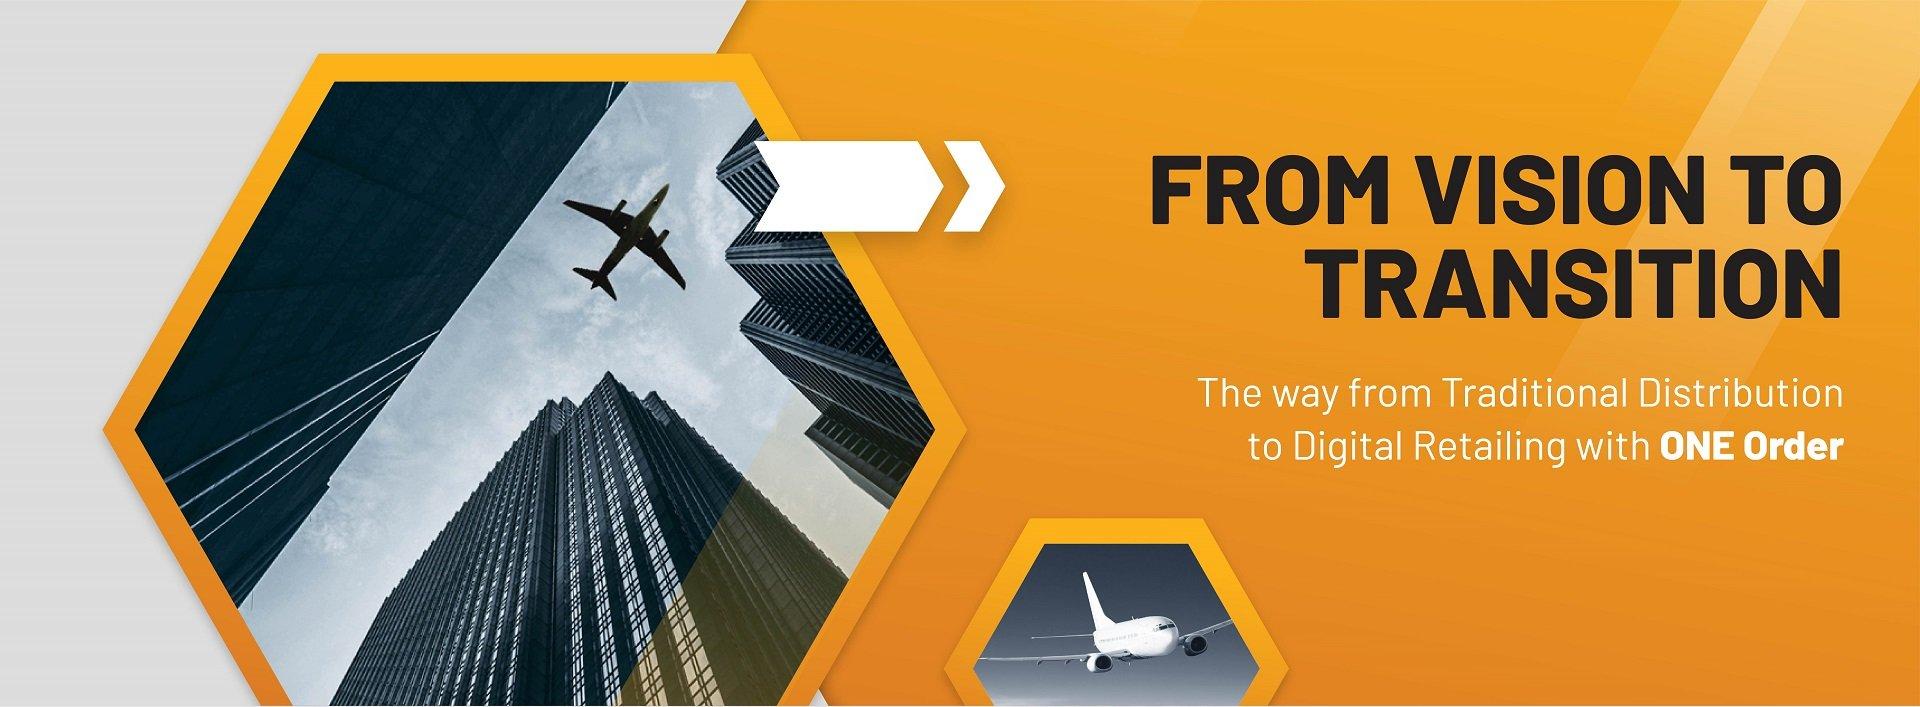 Aviation Whitepaper_ONE Order-1